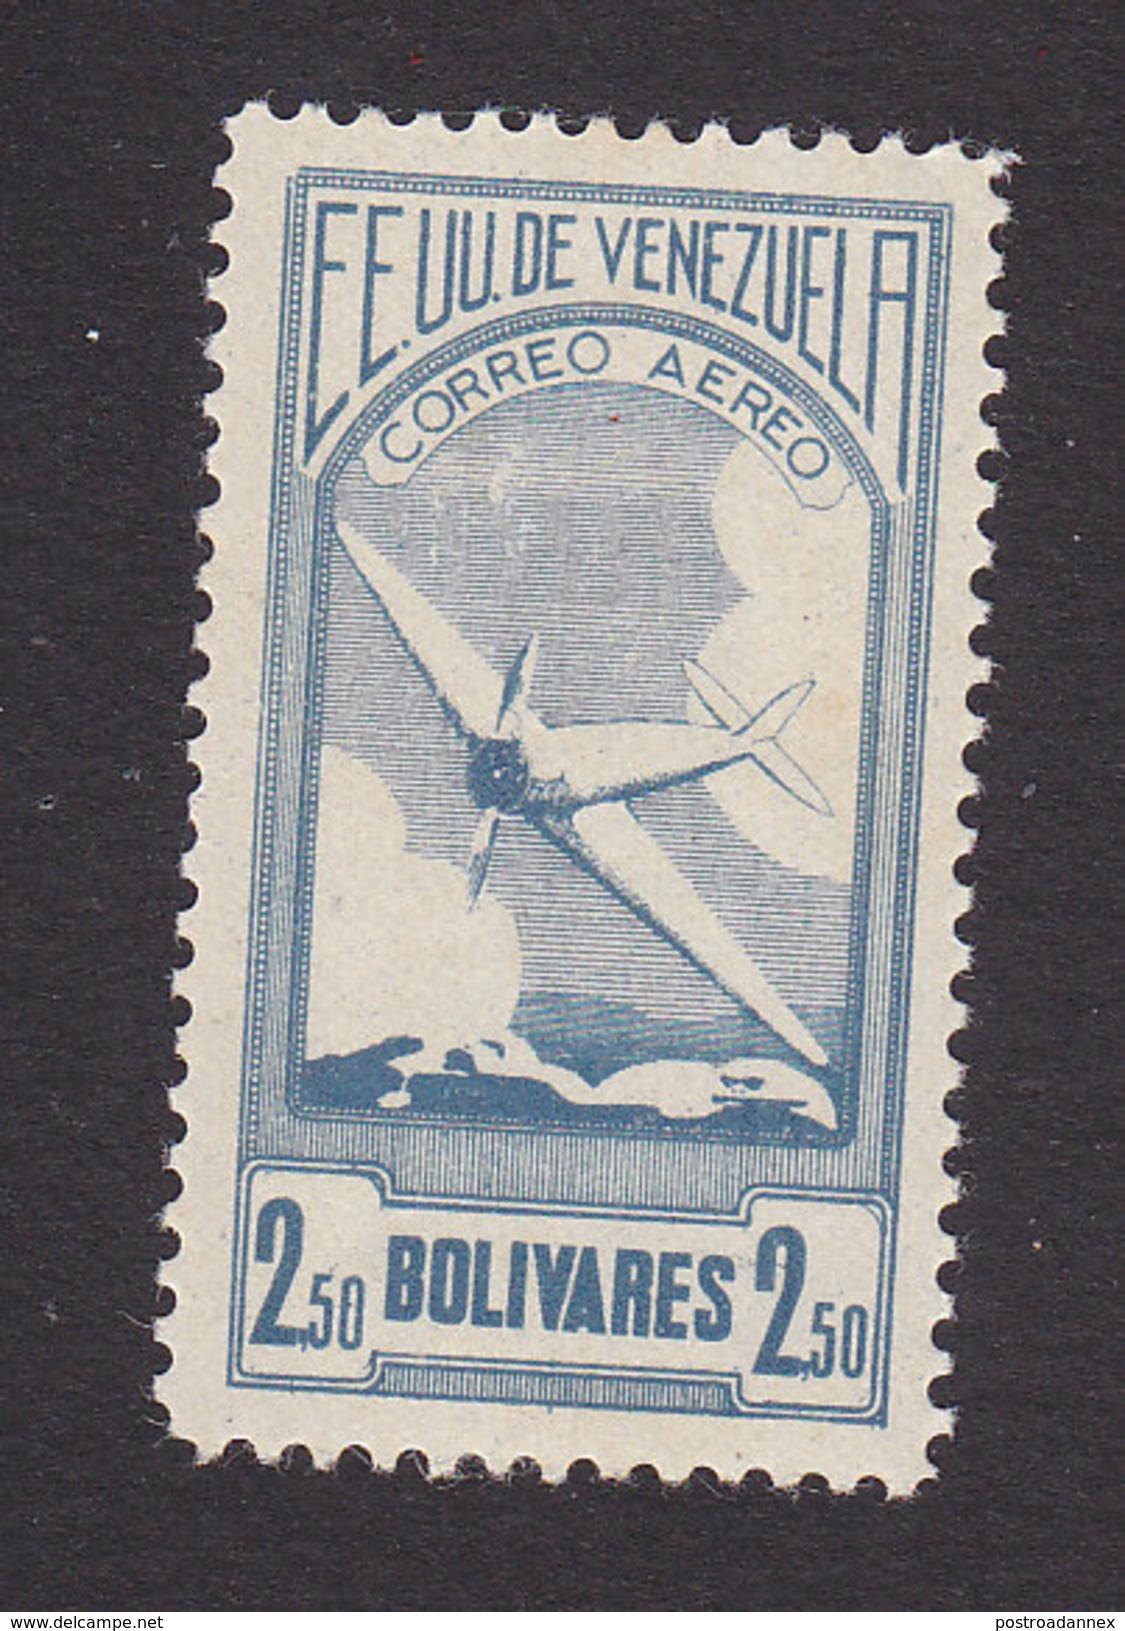 Venezuela, Scott #C59, Mint Hinged, Plane, Issued 1937 - Venezuela